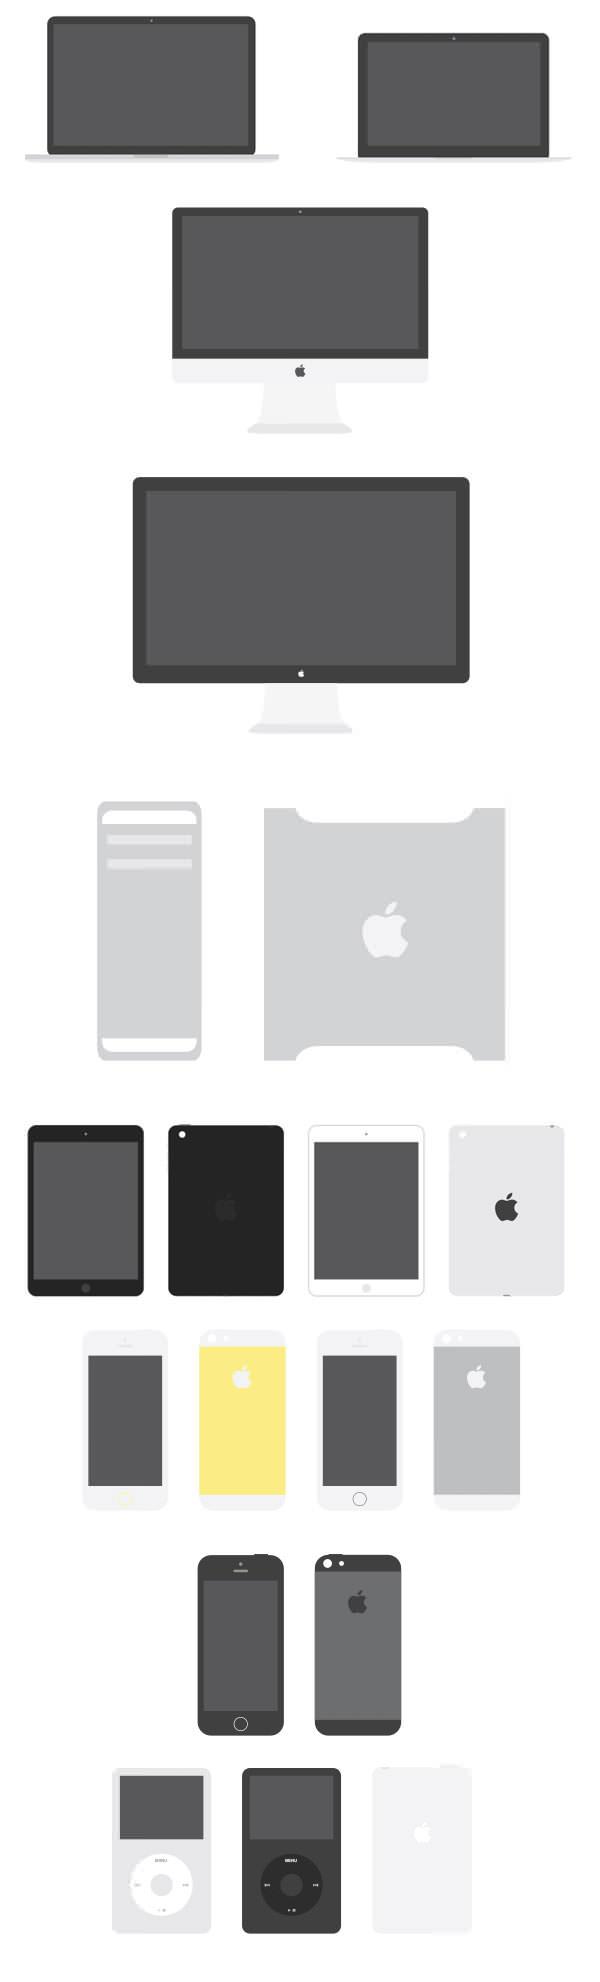 apple-600_2